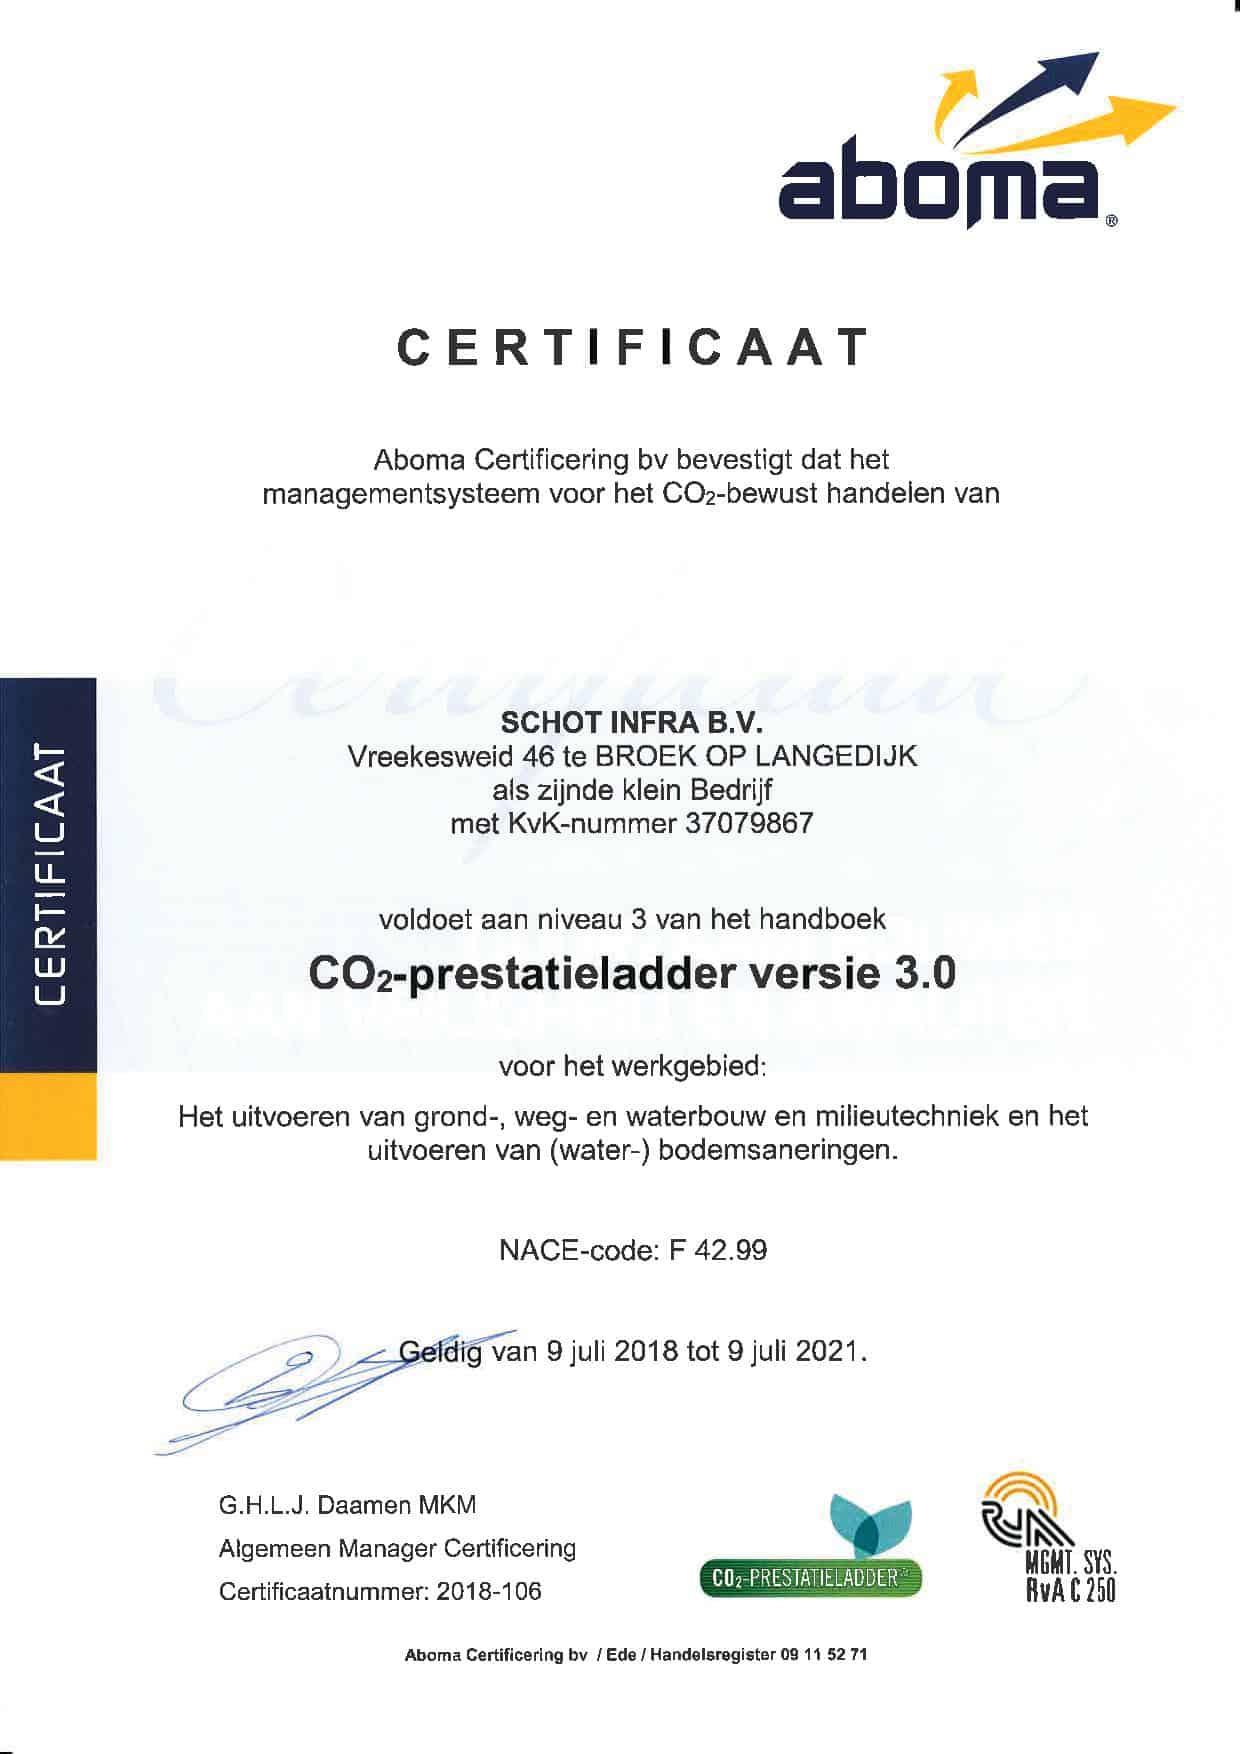 CO2-prestatieladder versie 3 0 geldig tot 09-07-2021